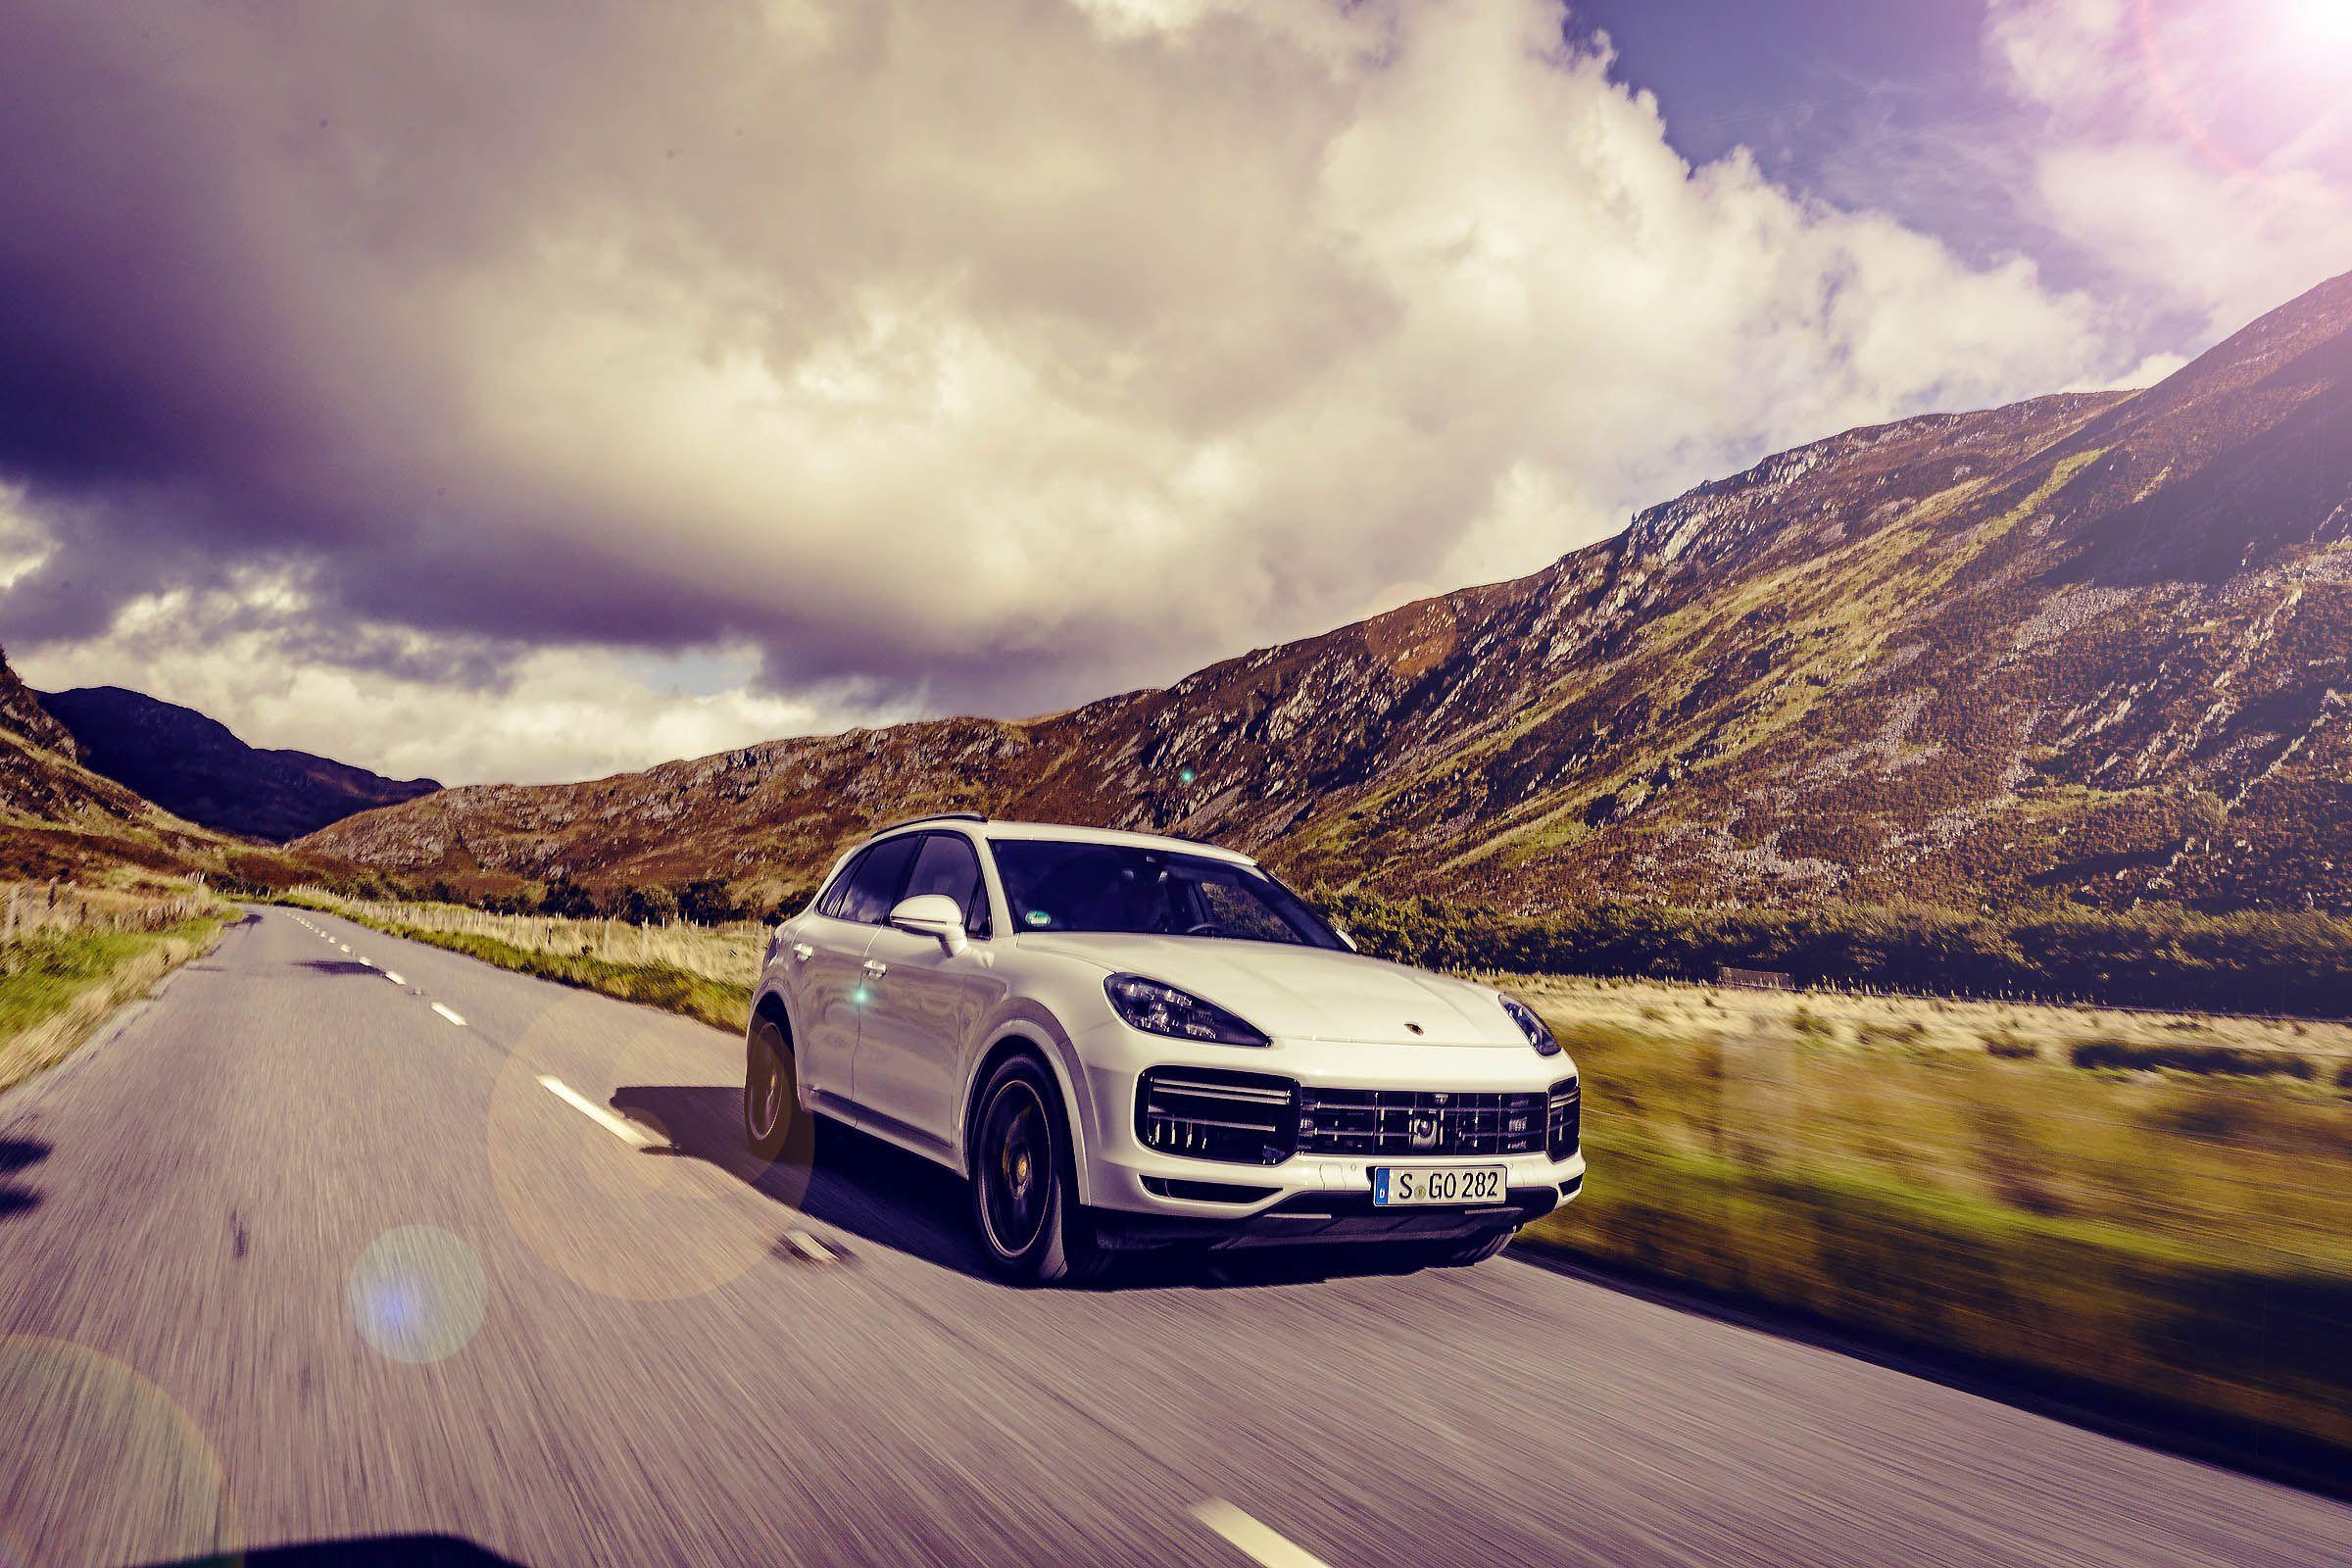 2018 Porsche Cayenne Turbo Typ Po536 Road Test Drive My